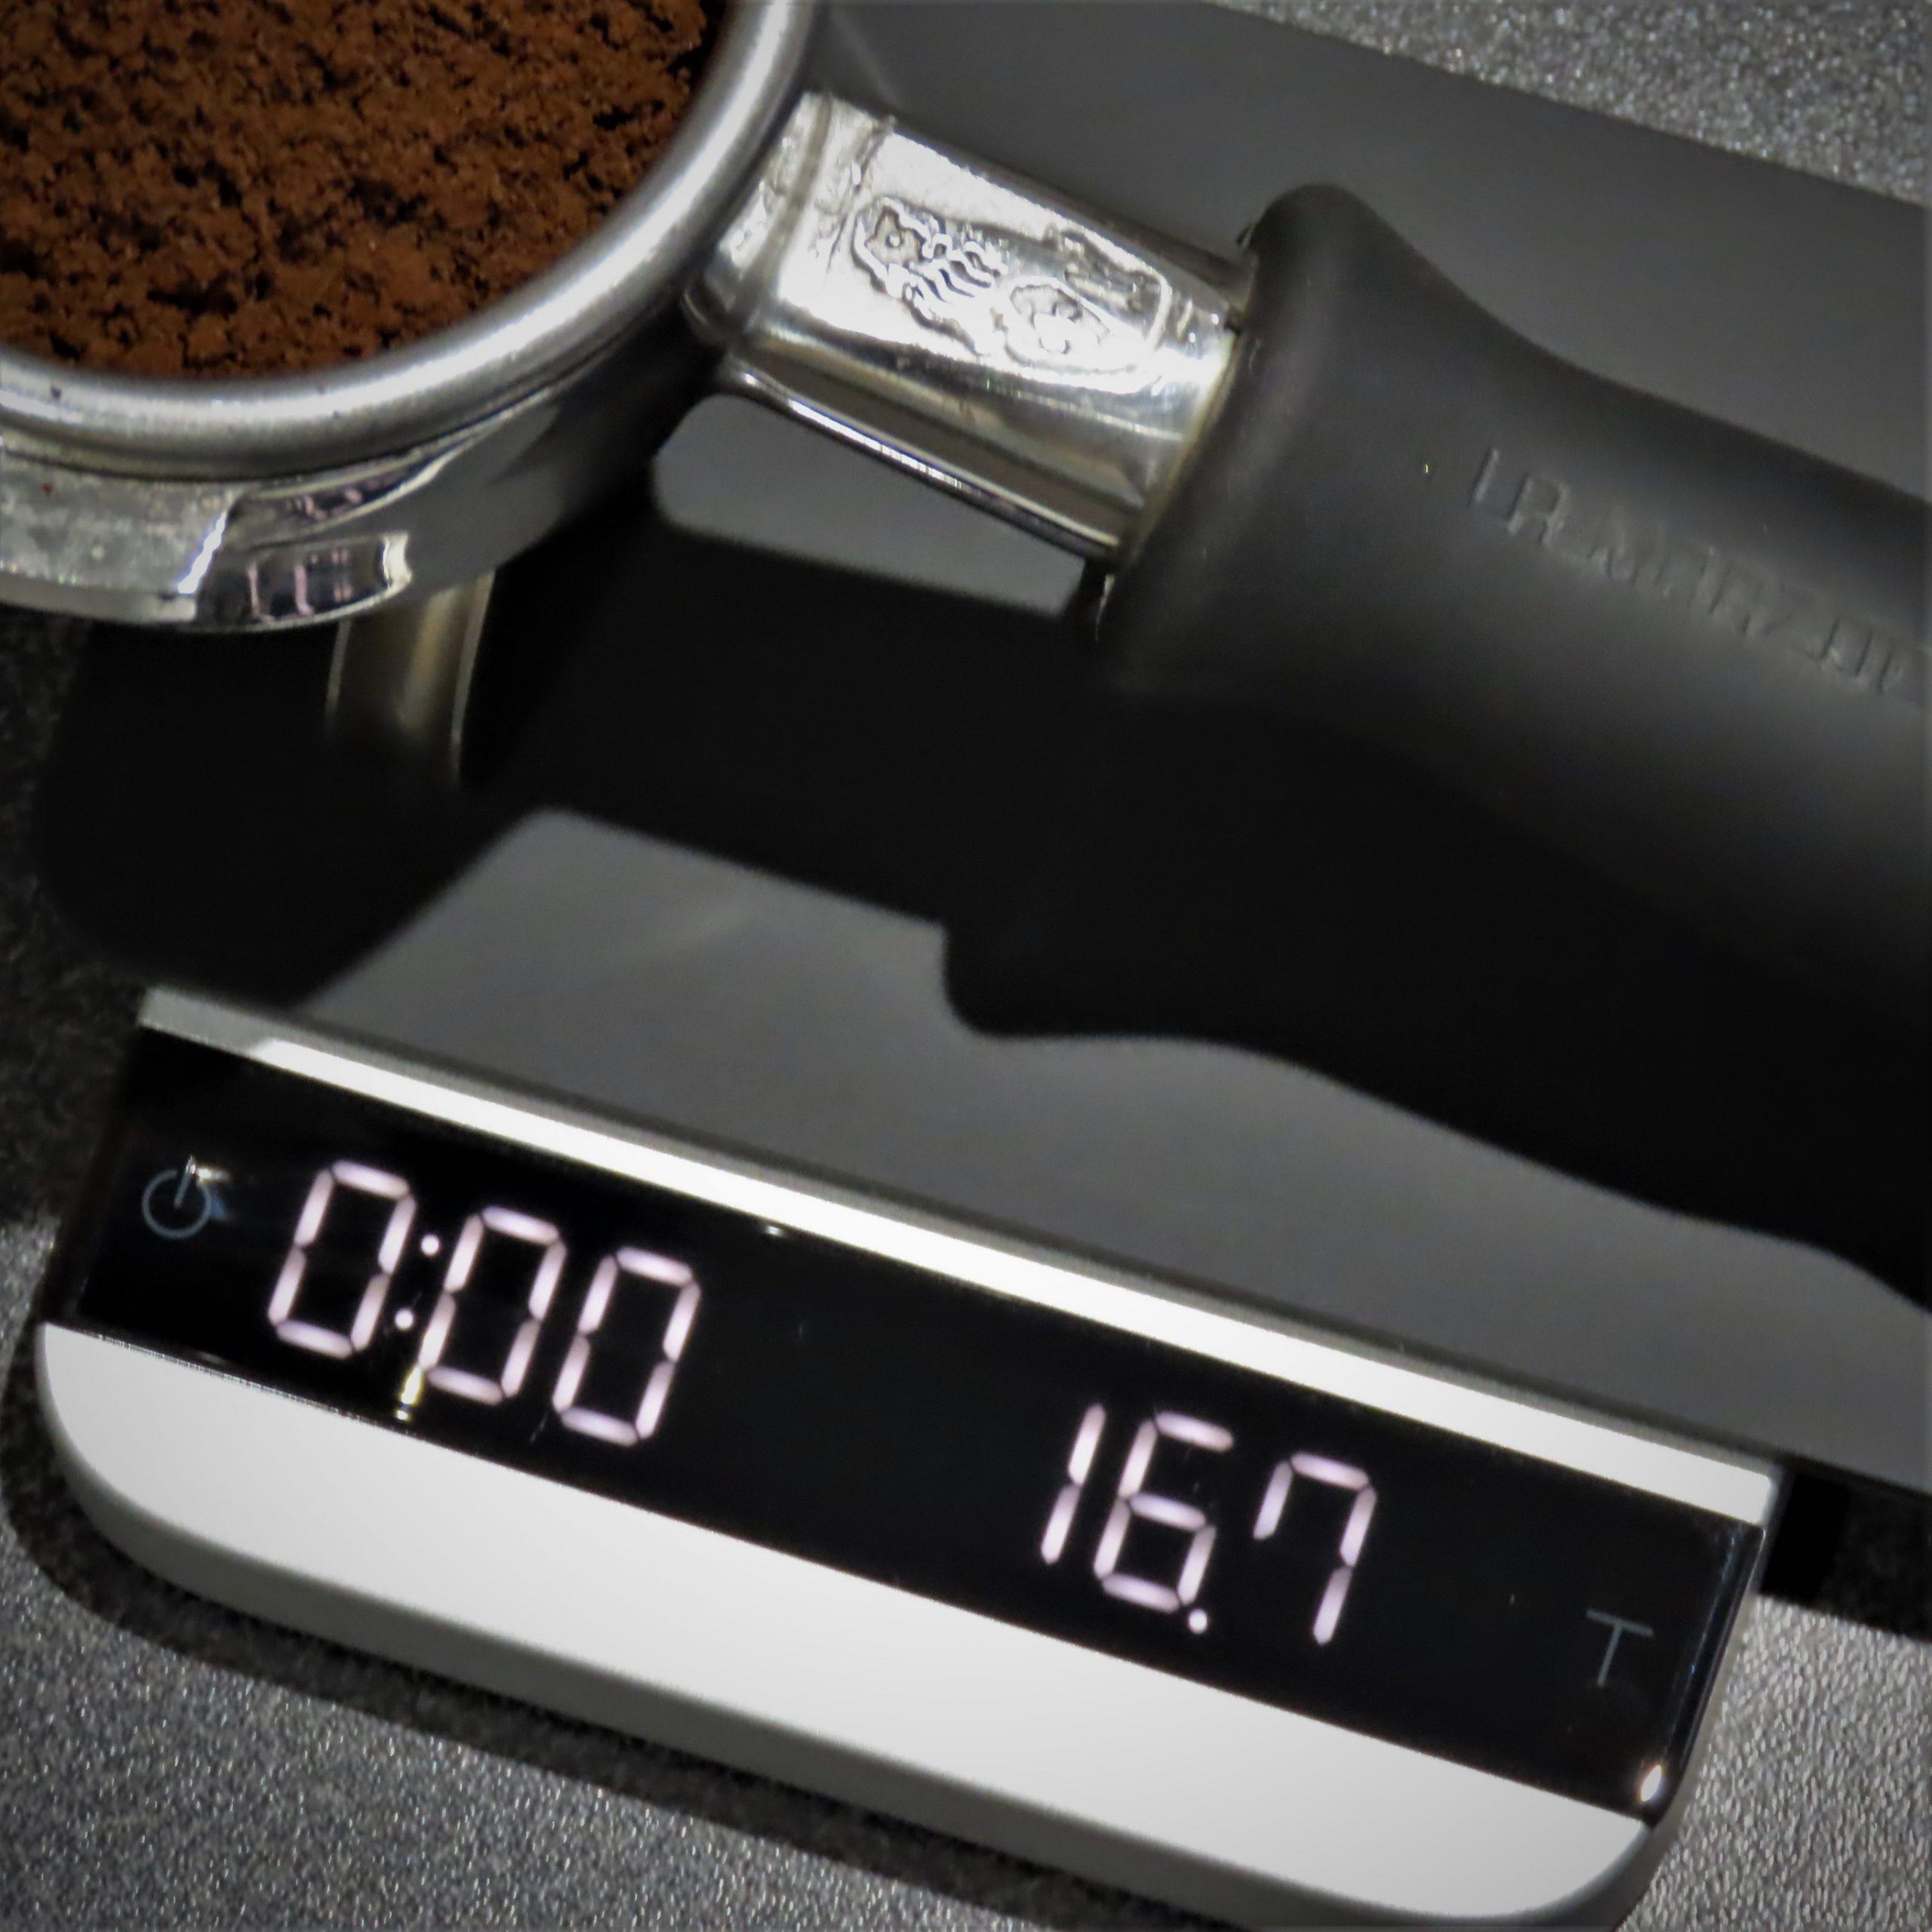 Lunar Espresso scales from Acaia